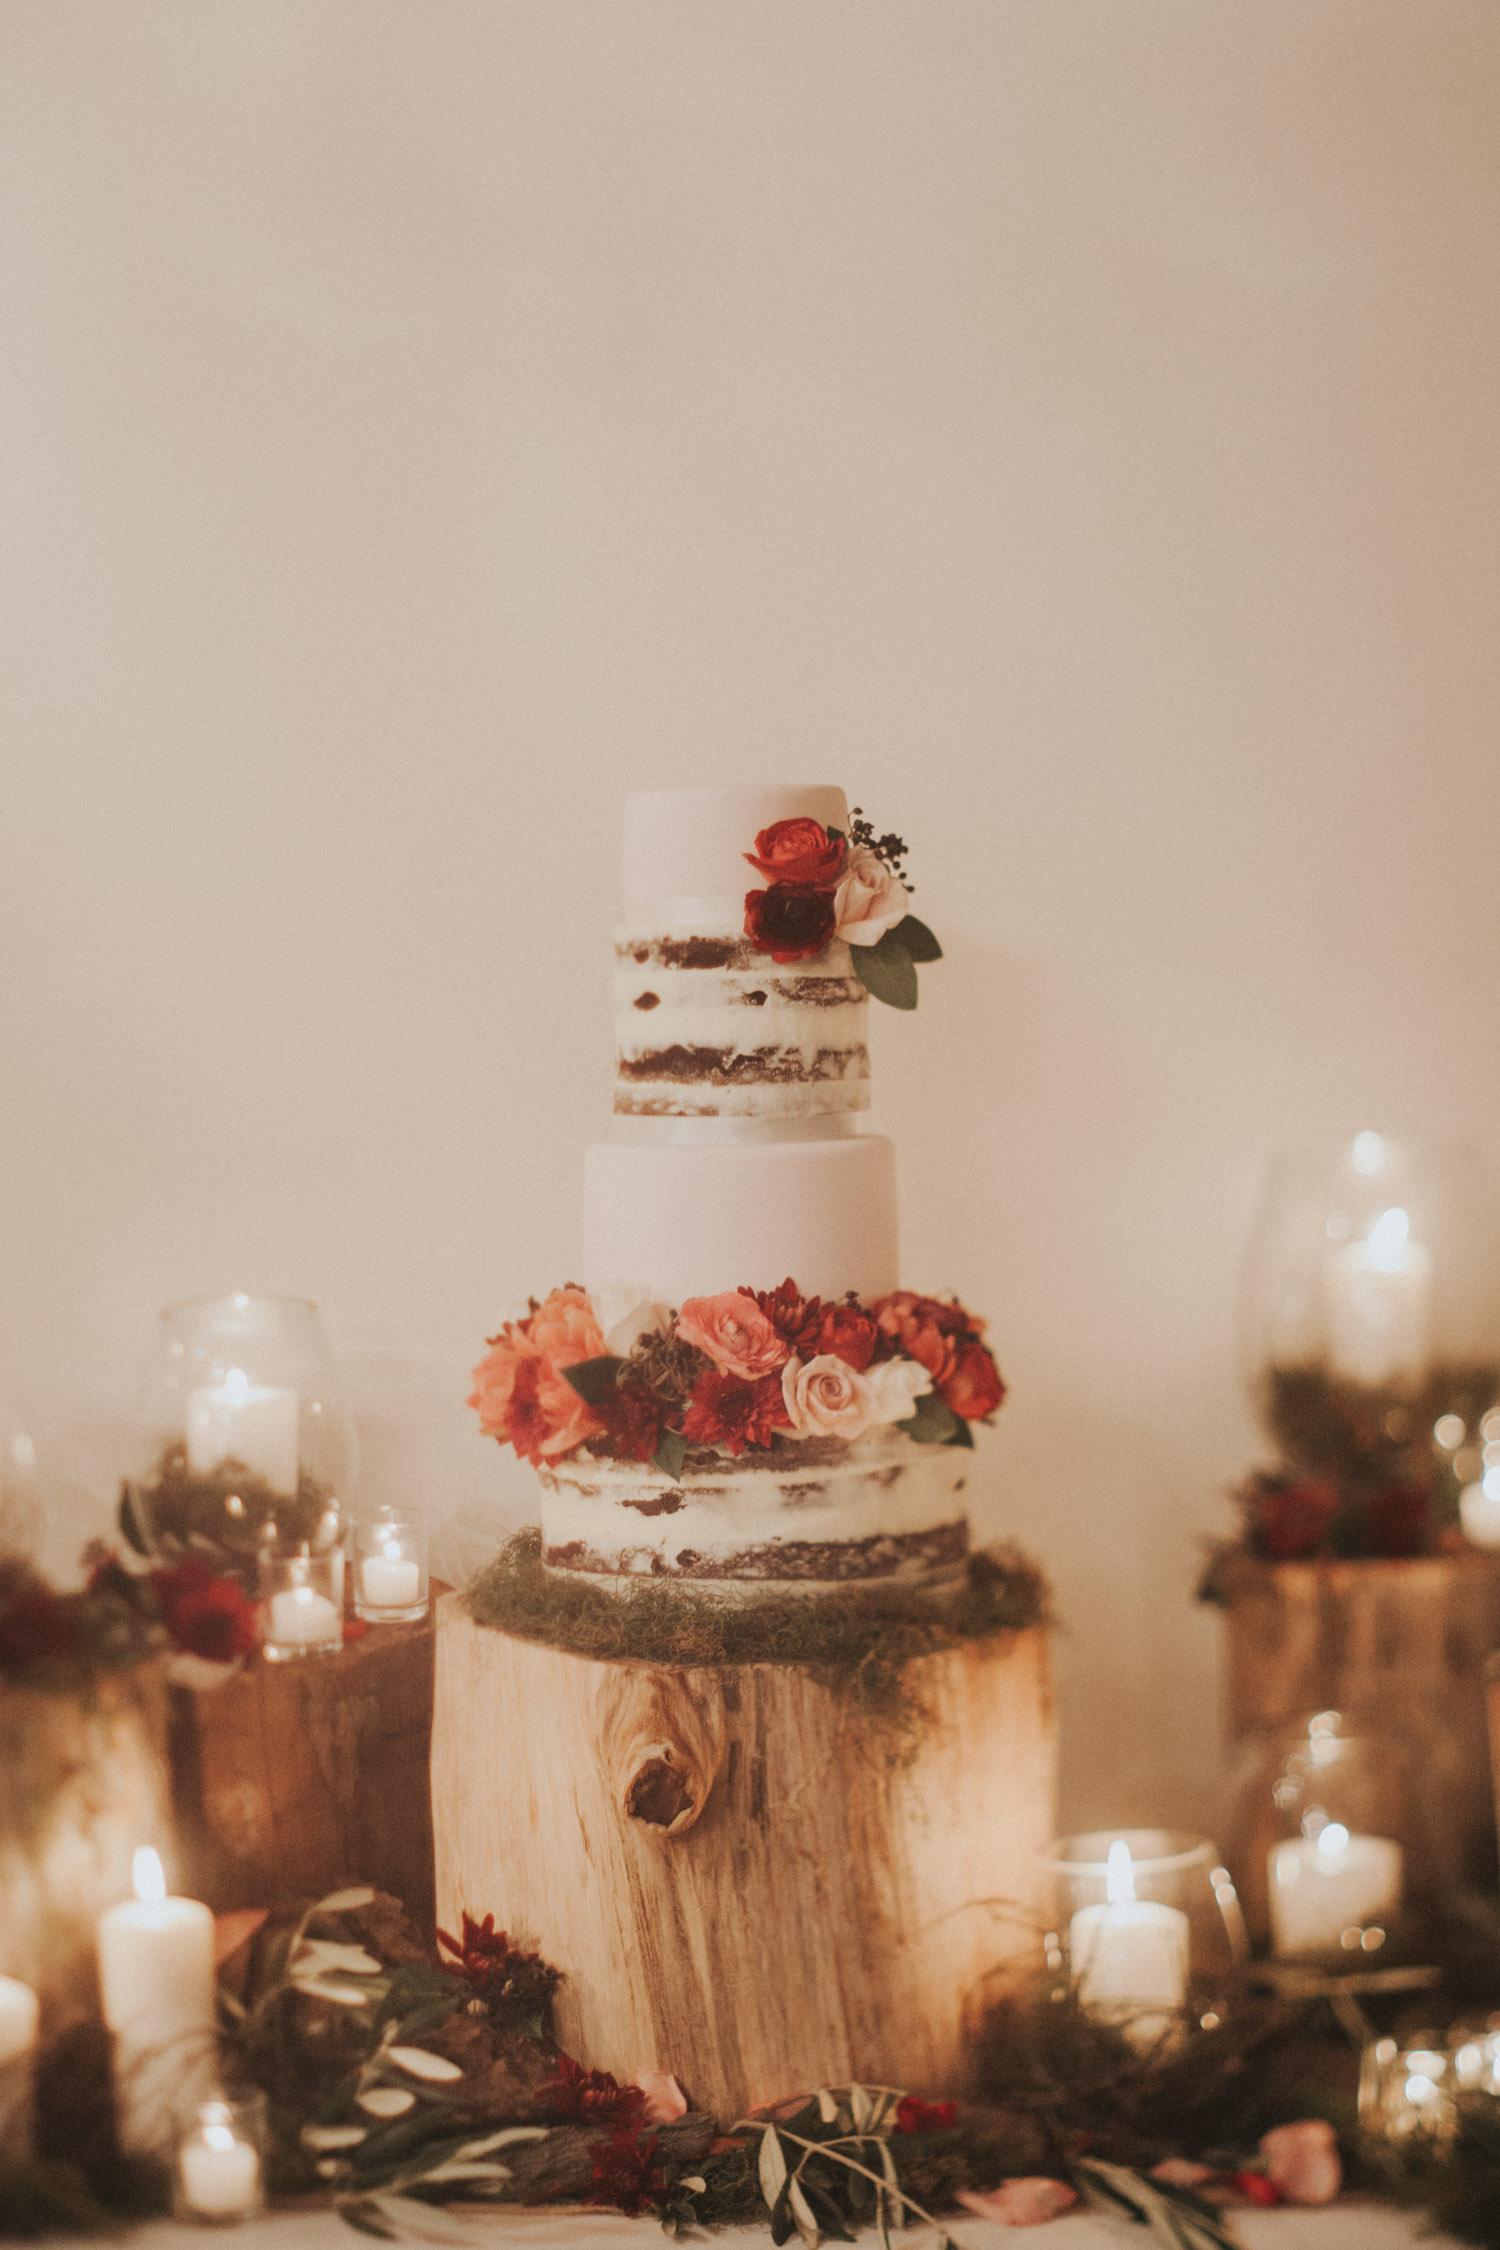 Wedding cake made by Sweet Bakery and Cakery, Wellington